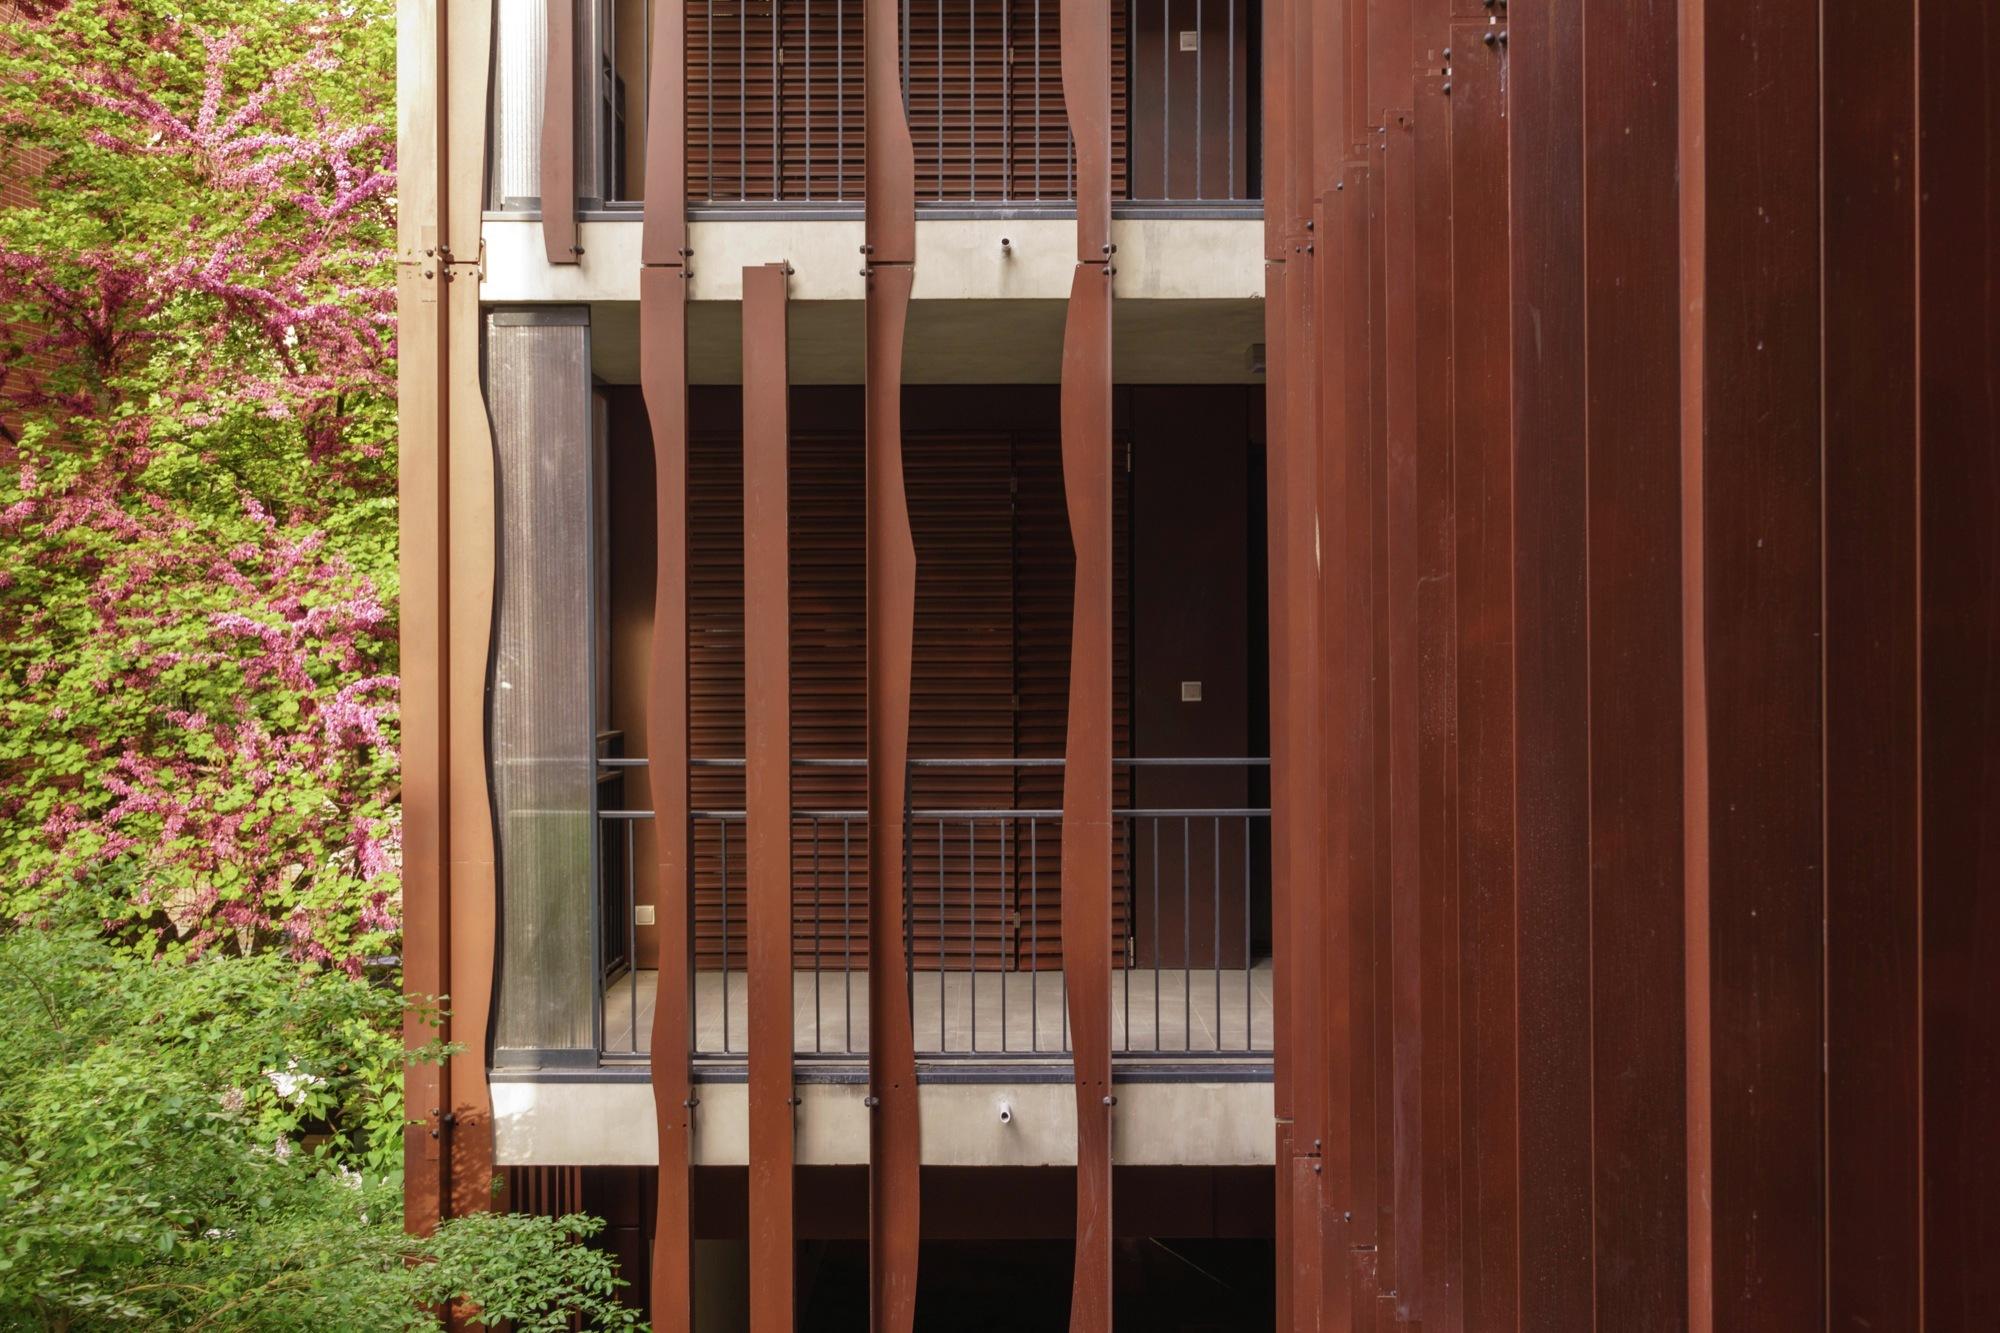 galeria de resid ncia yaoitcha taillandier architectes associ s 8. Black Bedroom Furniture Sets. Home Design Ideas